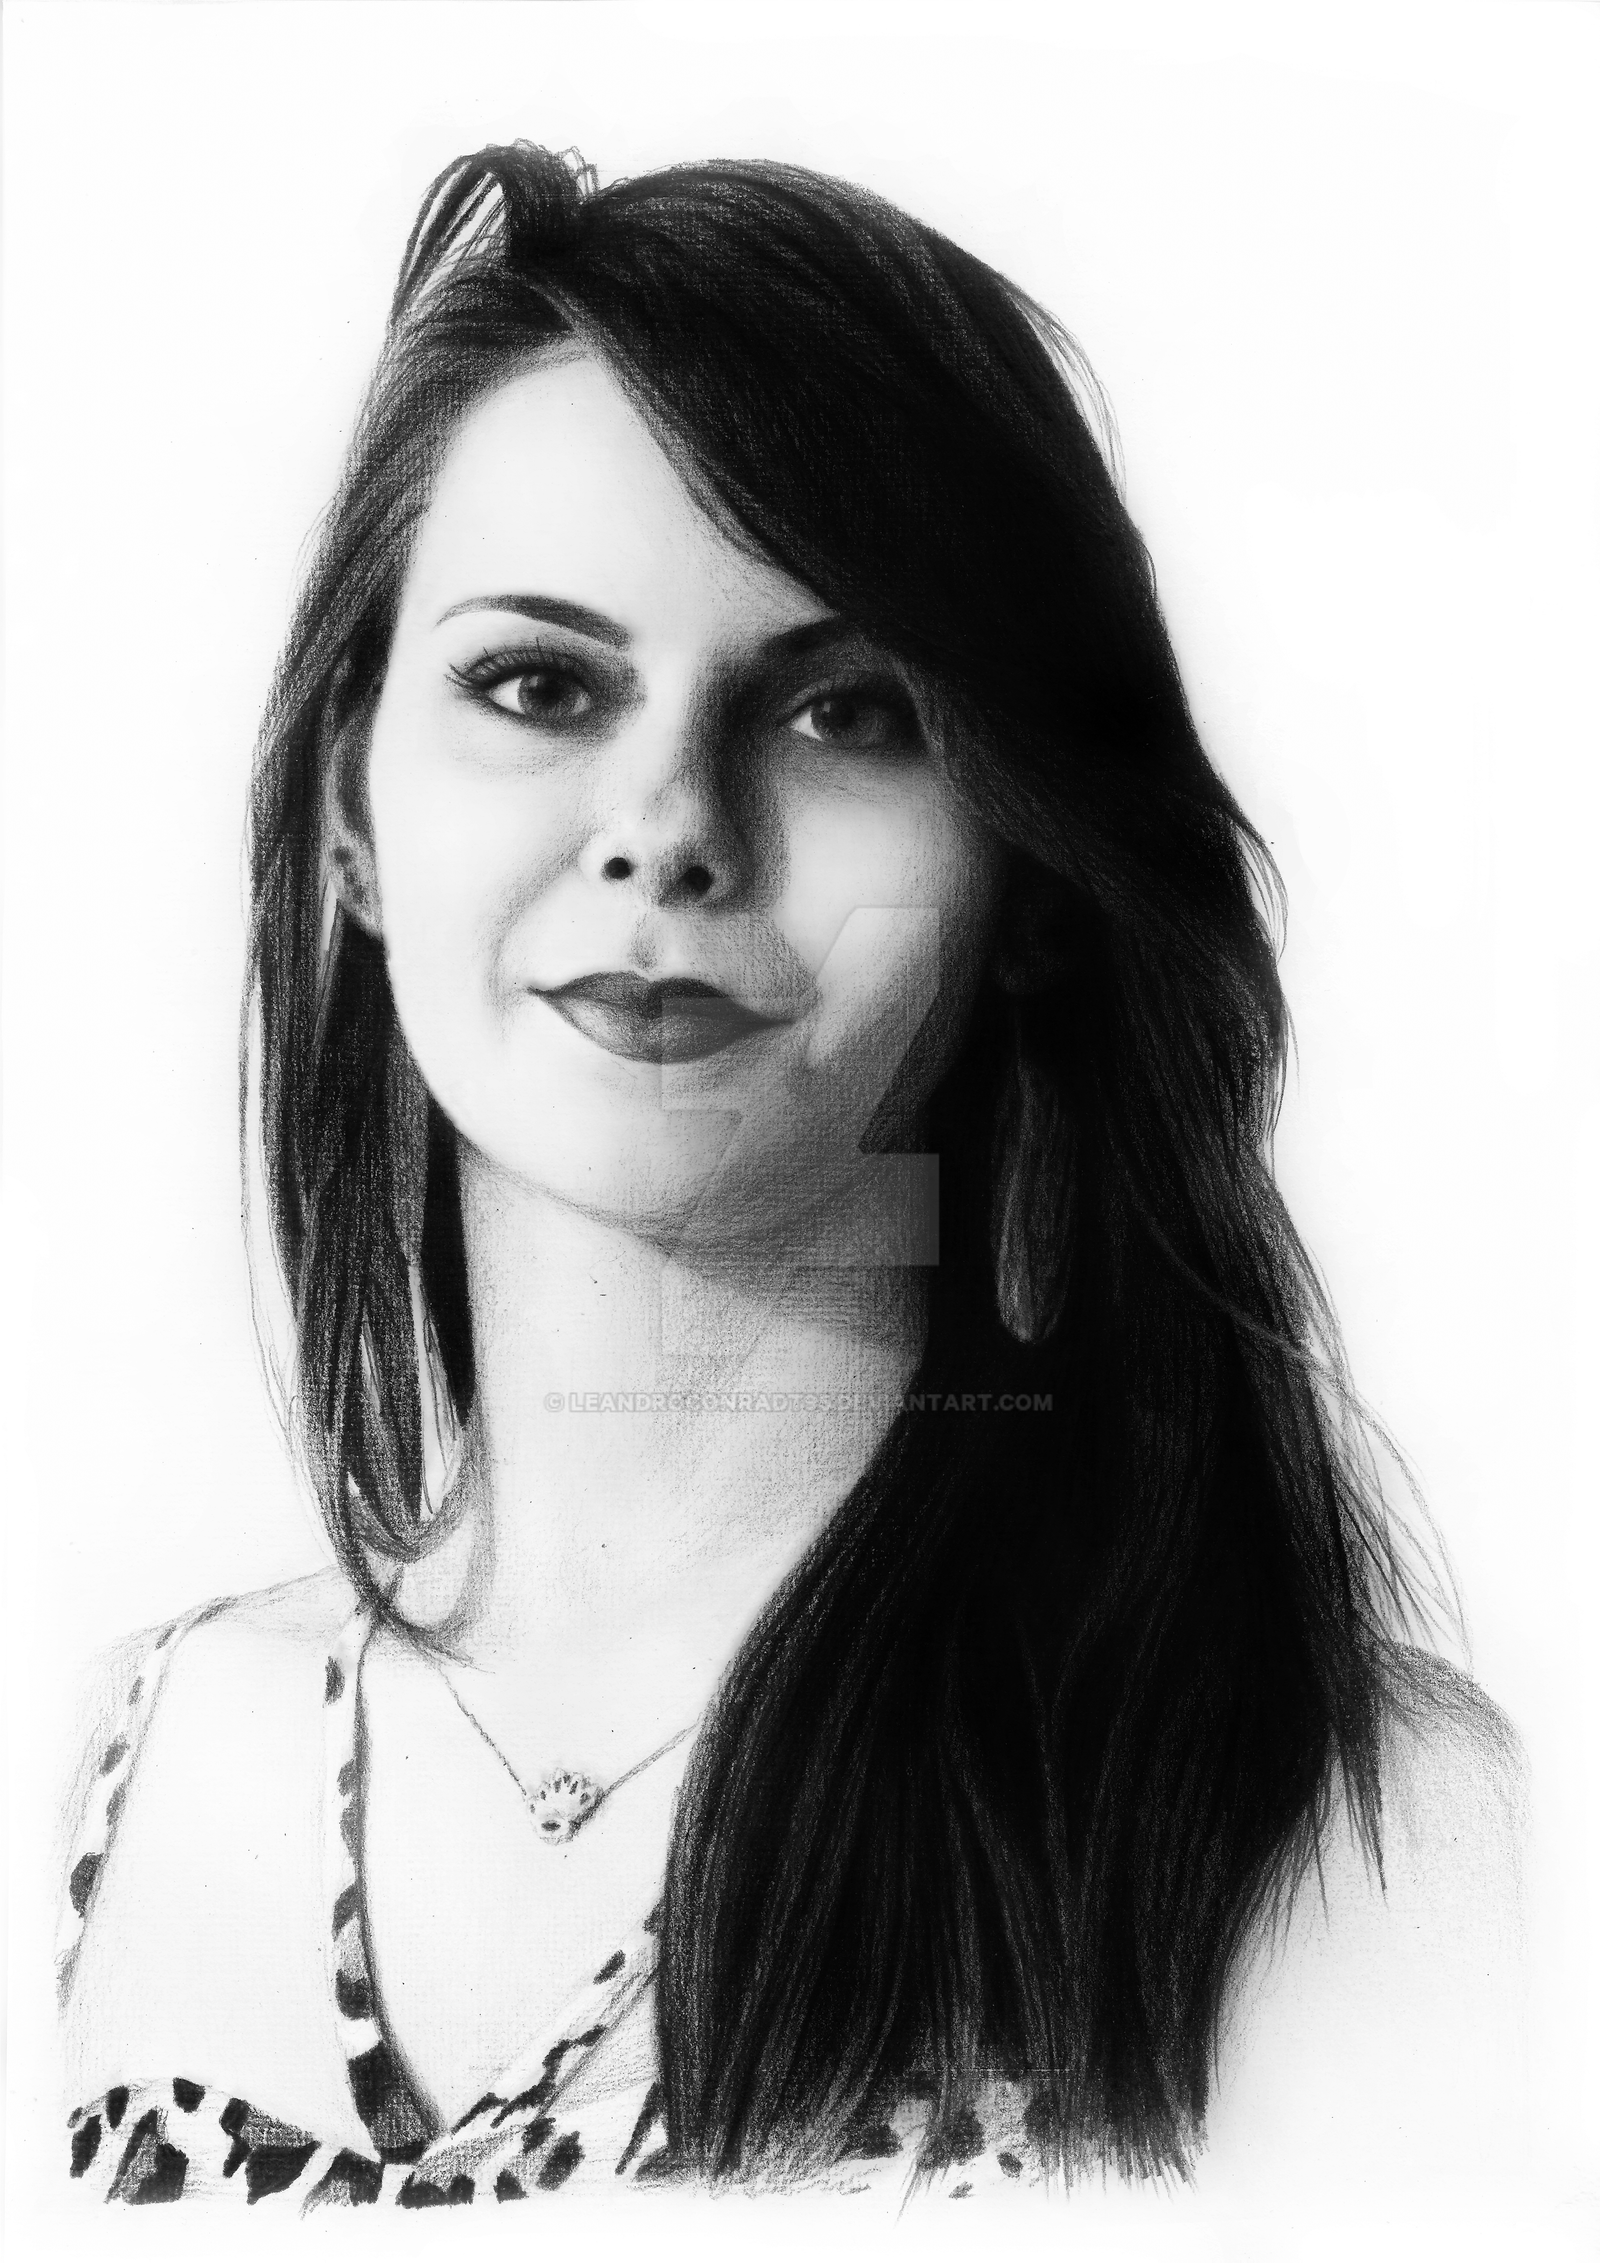 Eliane Drawing 02 by leandroconradt95